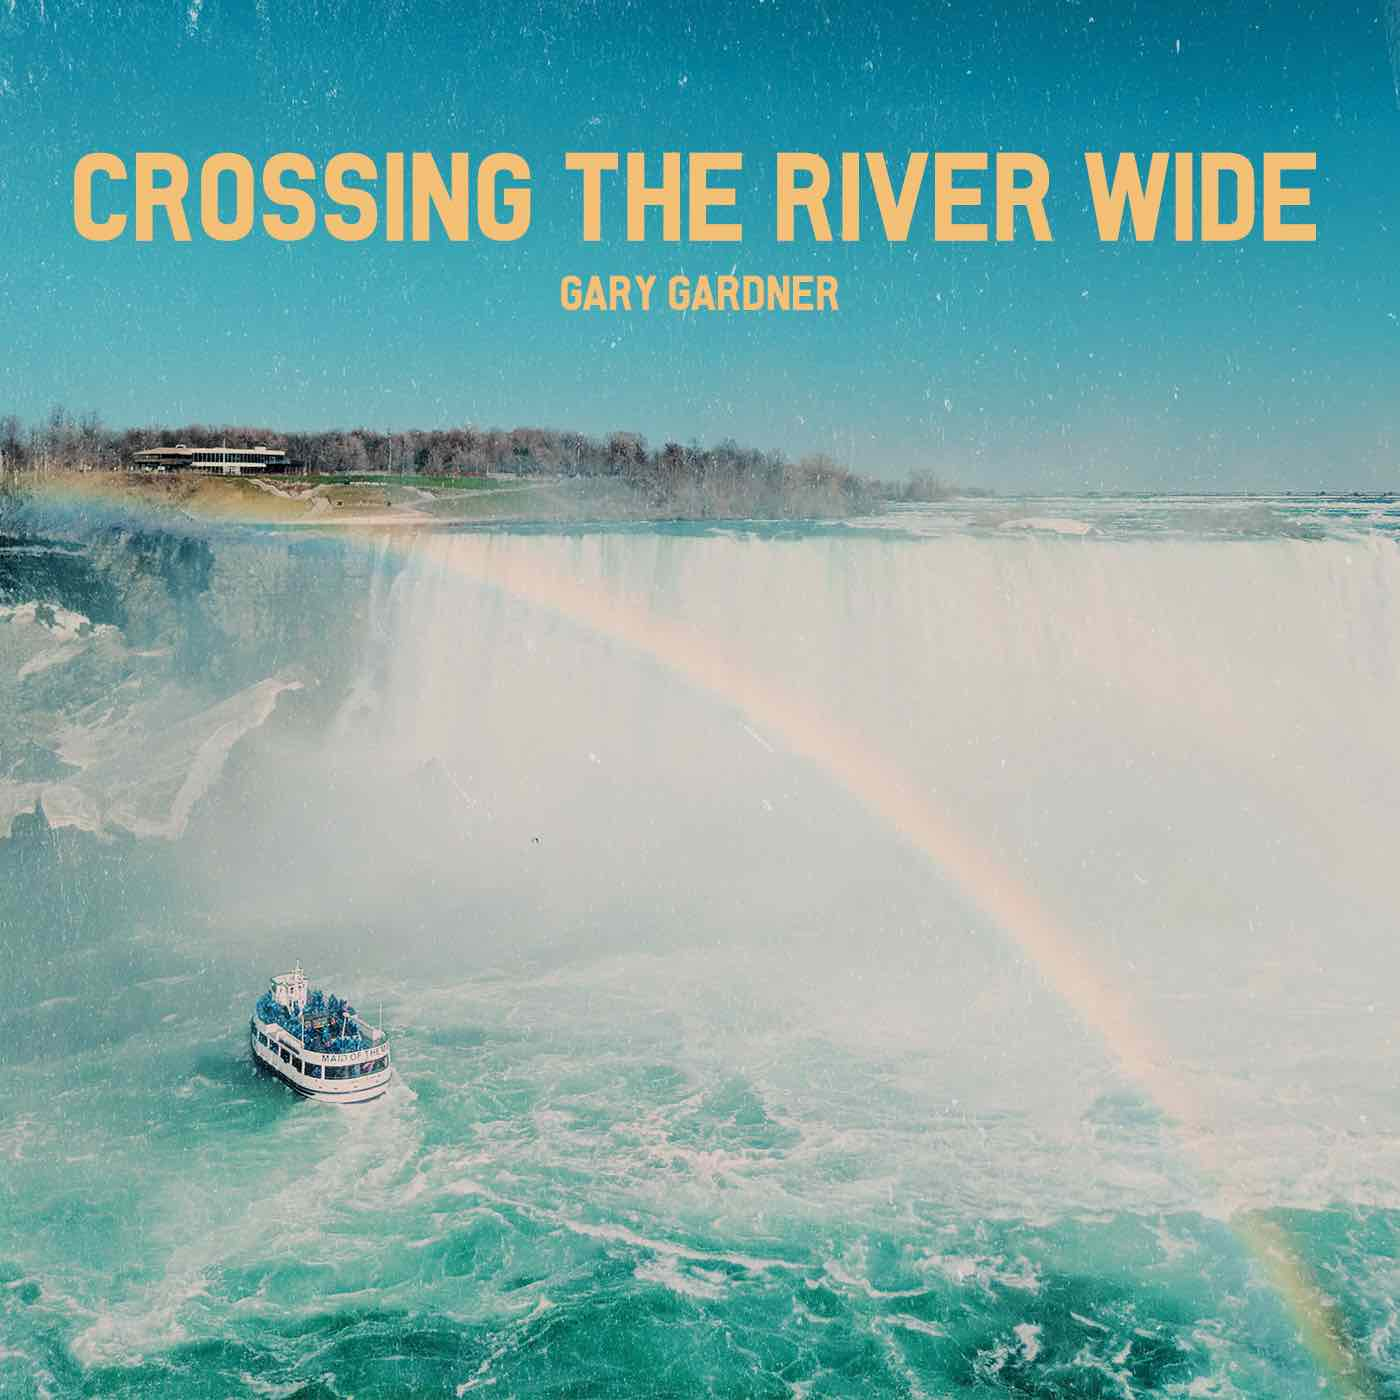 Crossing-The-River-Wide-Gary-Gardner